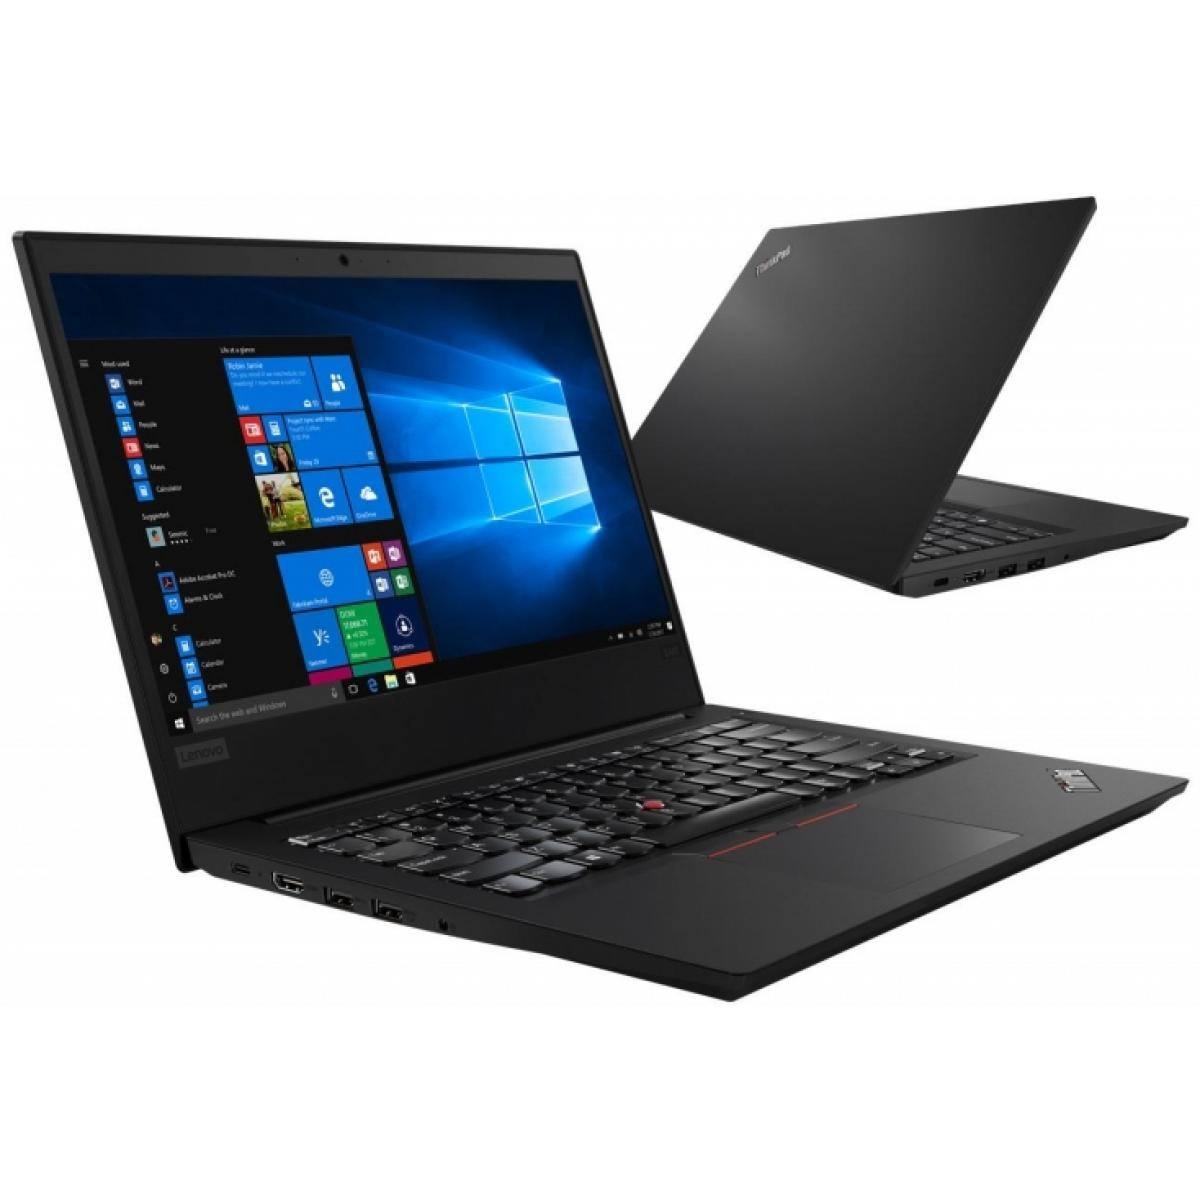 Lenovo ThinkPad E490s (20NGS01N00) | i7-8565U | 8GB DDR4 | SSD 256GB | VGA Onboard | 14.0 FHD | Free Dos >>> Deal giá mua, Trả góp 0%